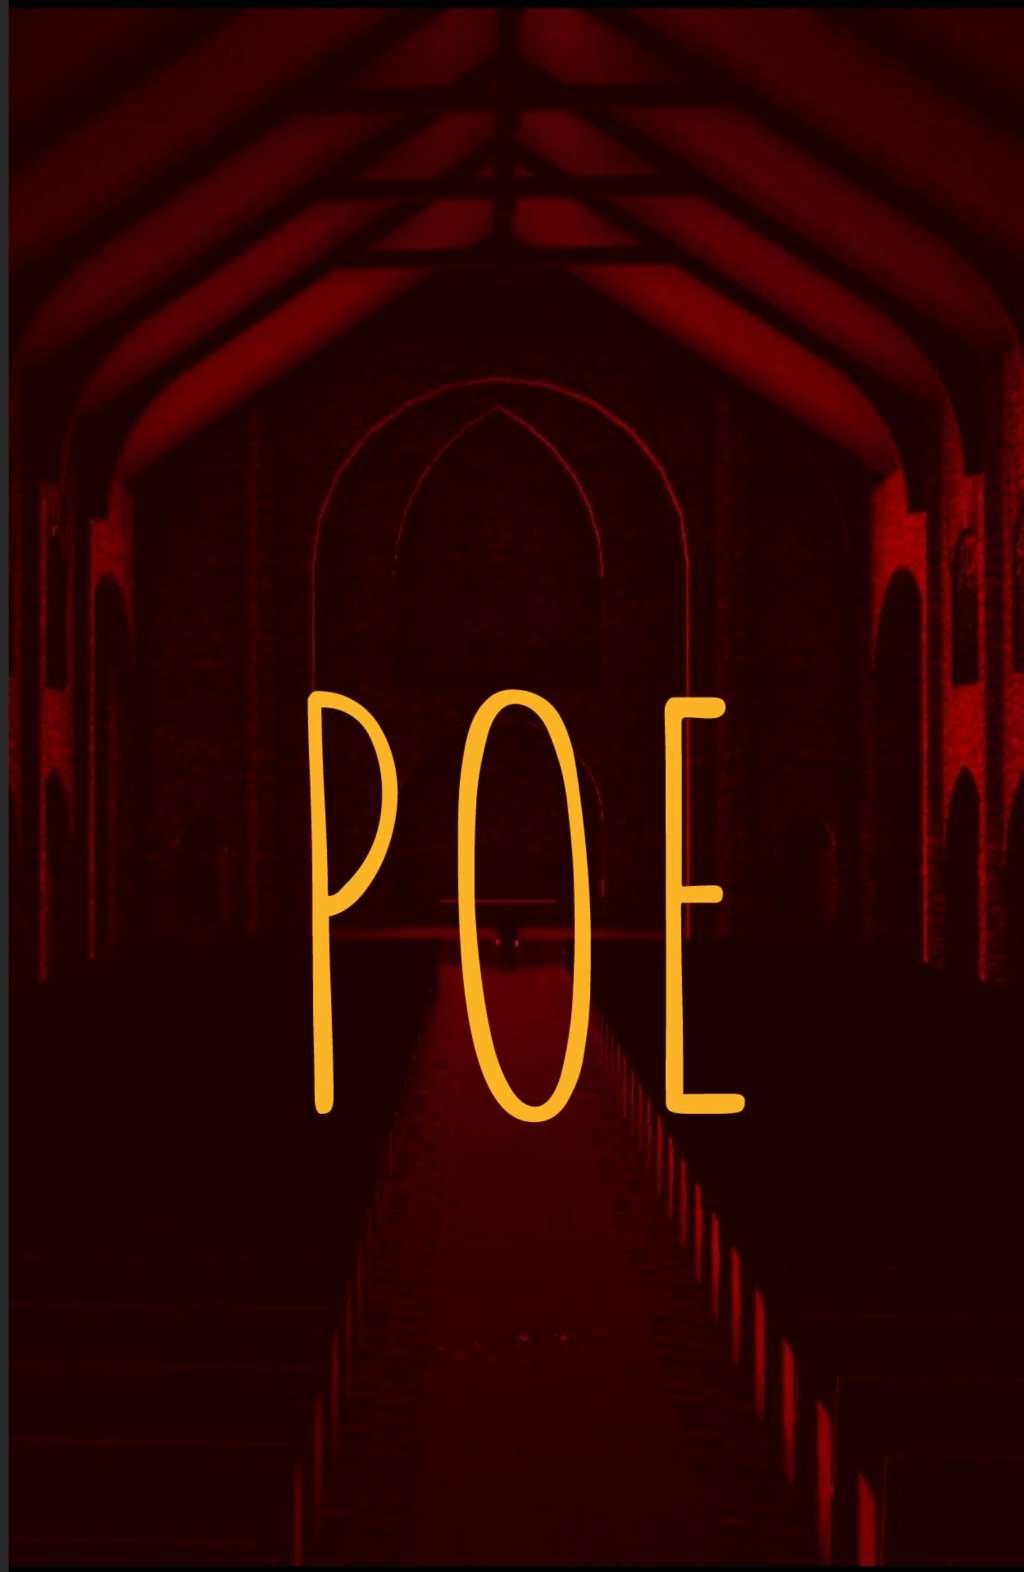 Poe kapak